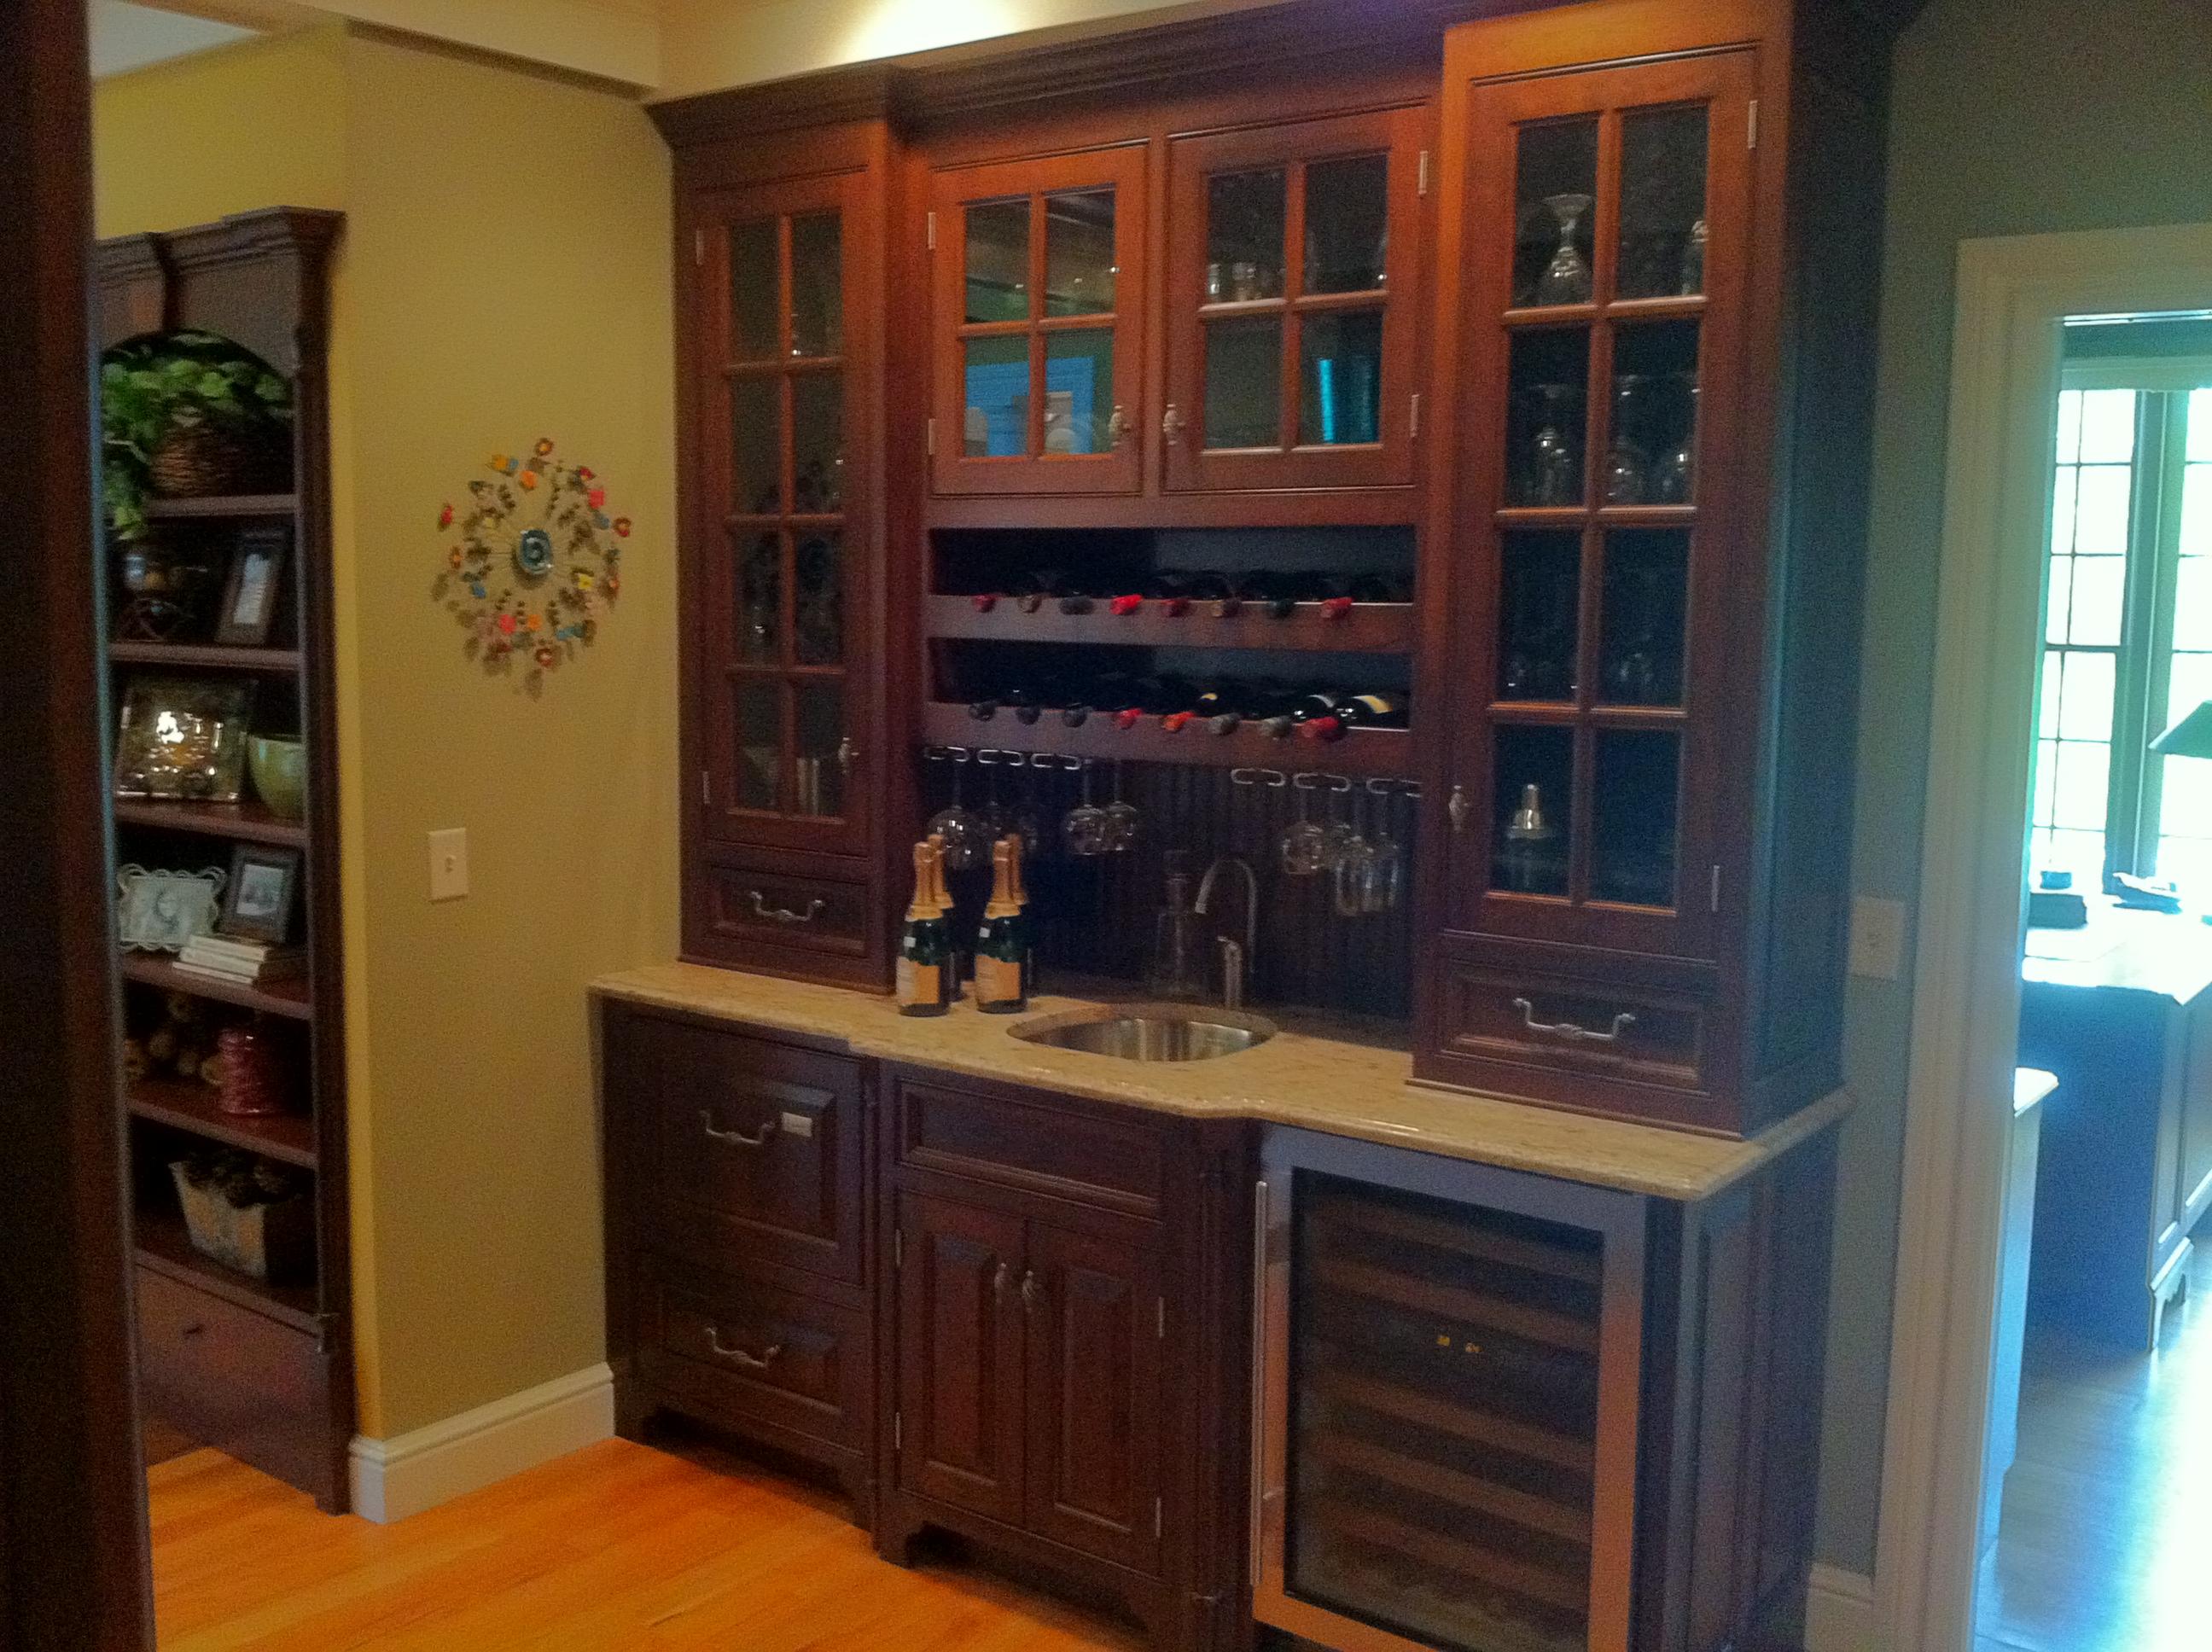 Cabinet Refinishing & Kitchen Remodeling in Rhode Island RI